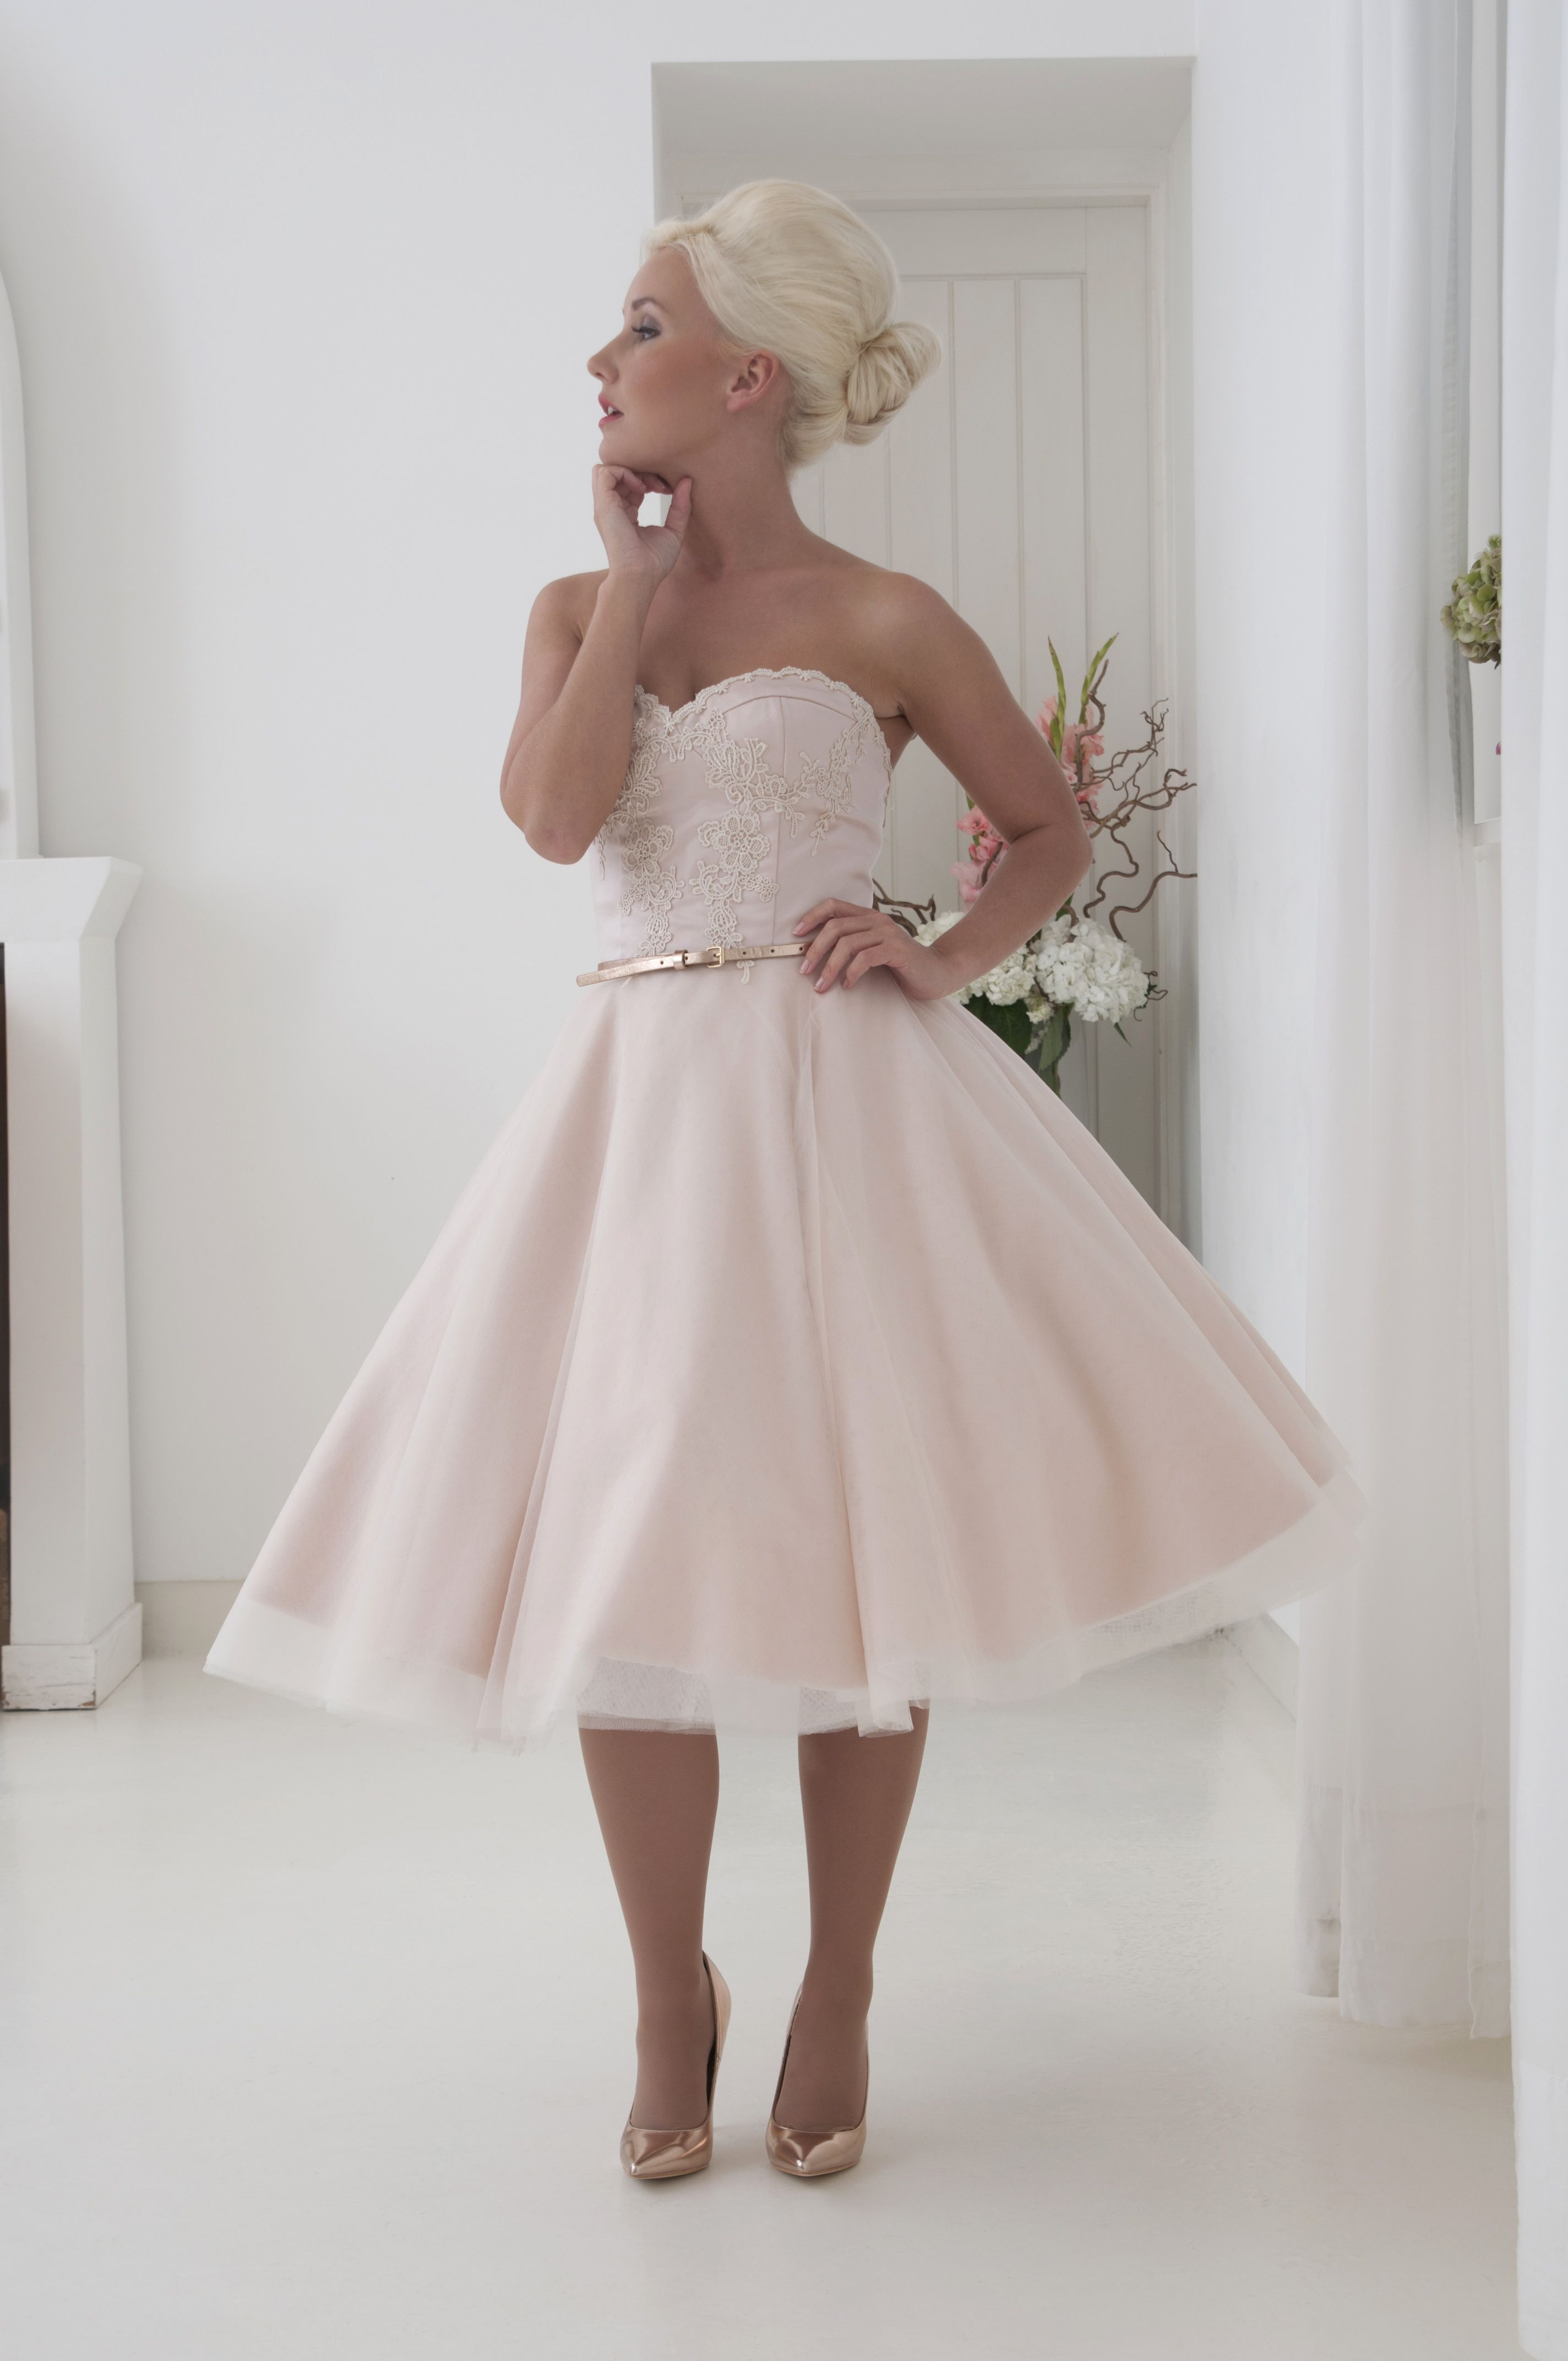 Elegant Blush Pink Strapless Satin And Tulle Short Tea Length Wedding Dress Lace Tulle Hou Tea Length Wedding Dress Tea Length Dresses Short Wedding Dress [ 4288 x 2848 Pixel ]